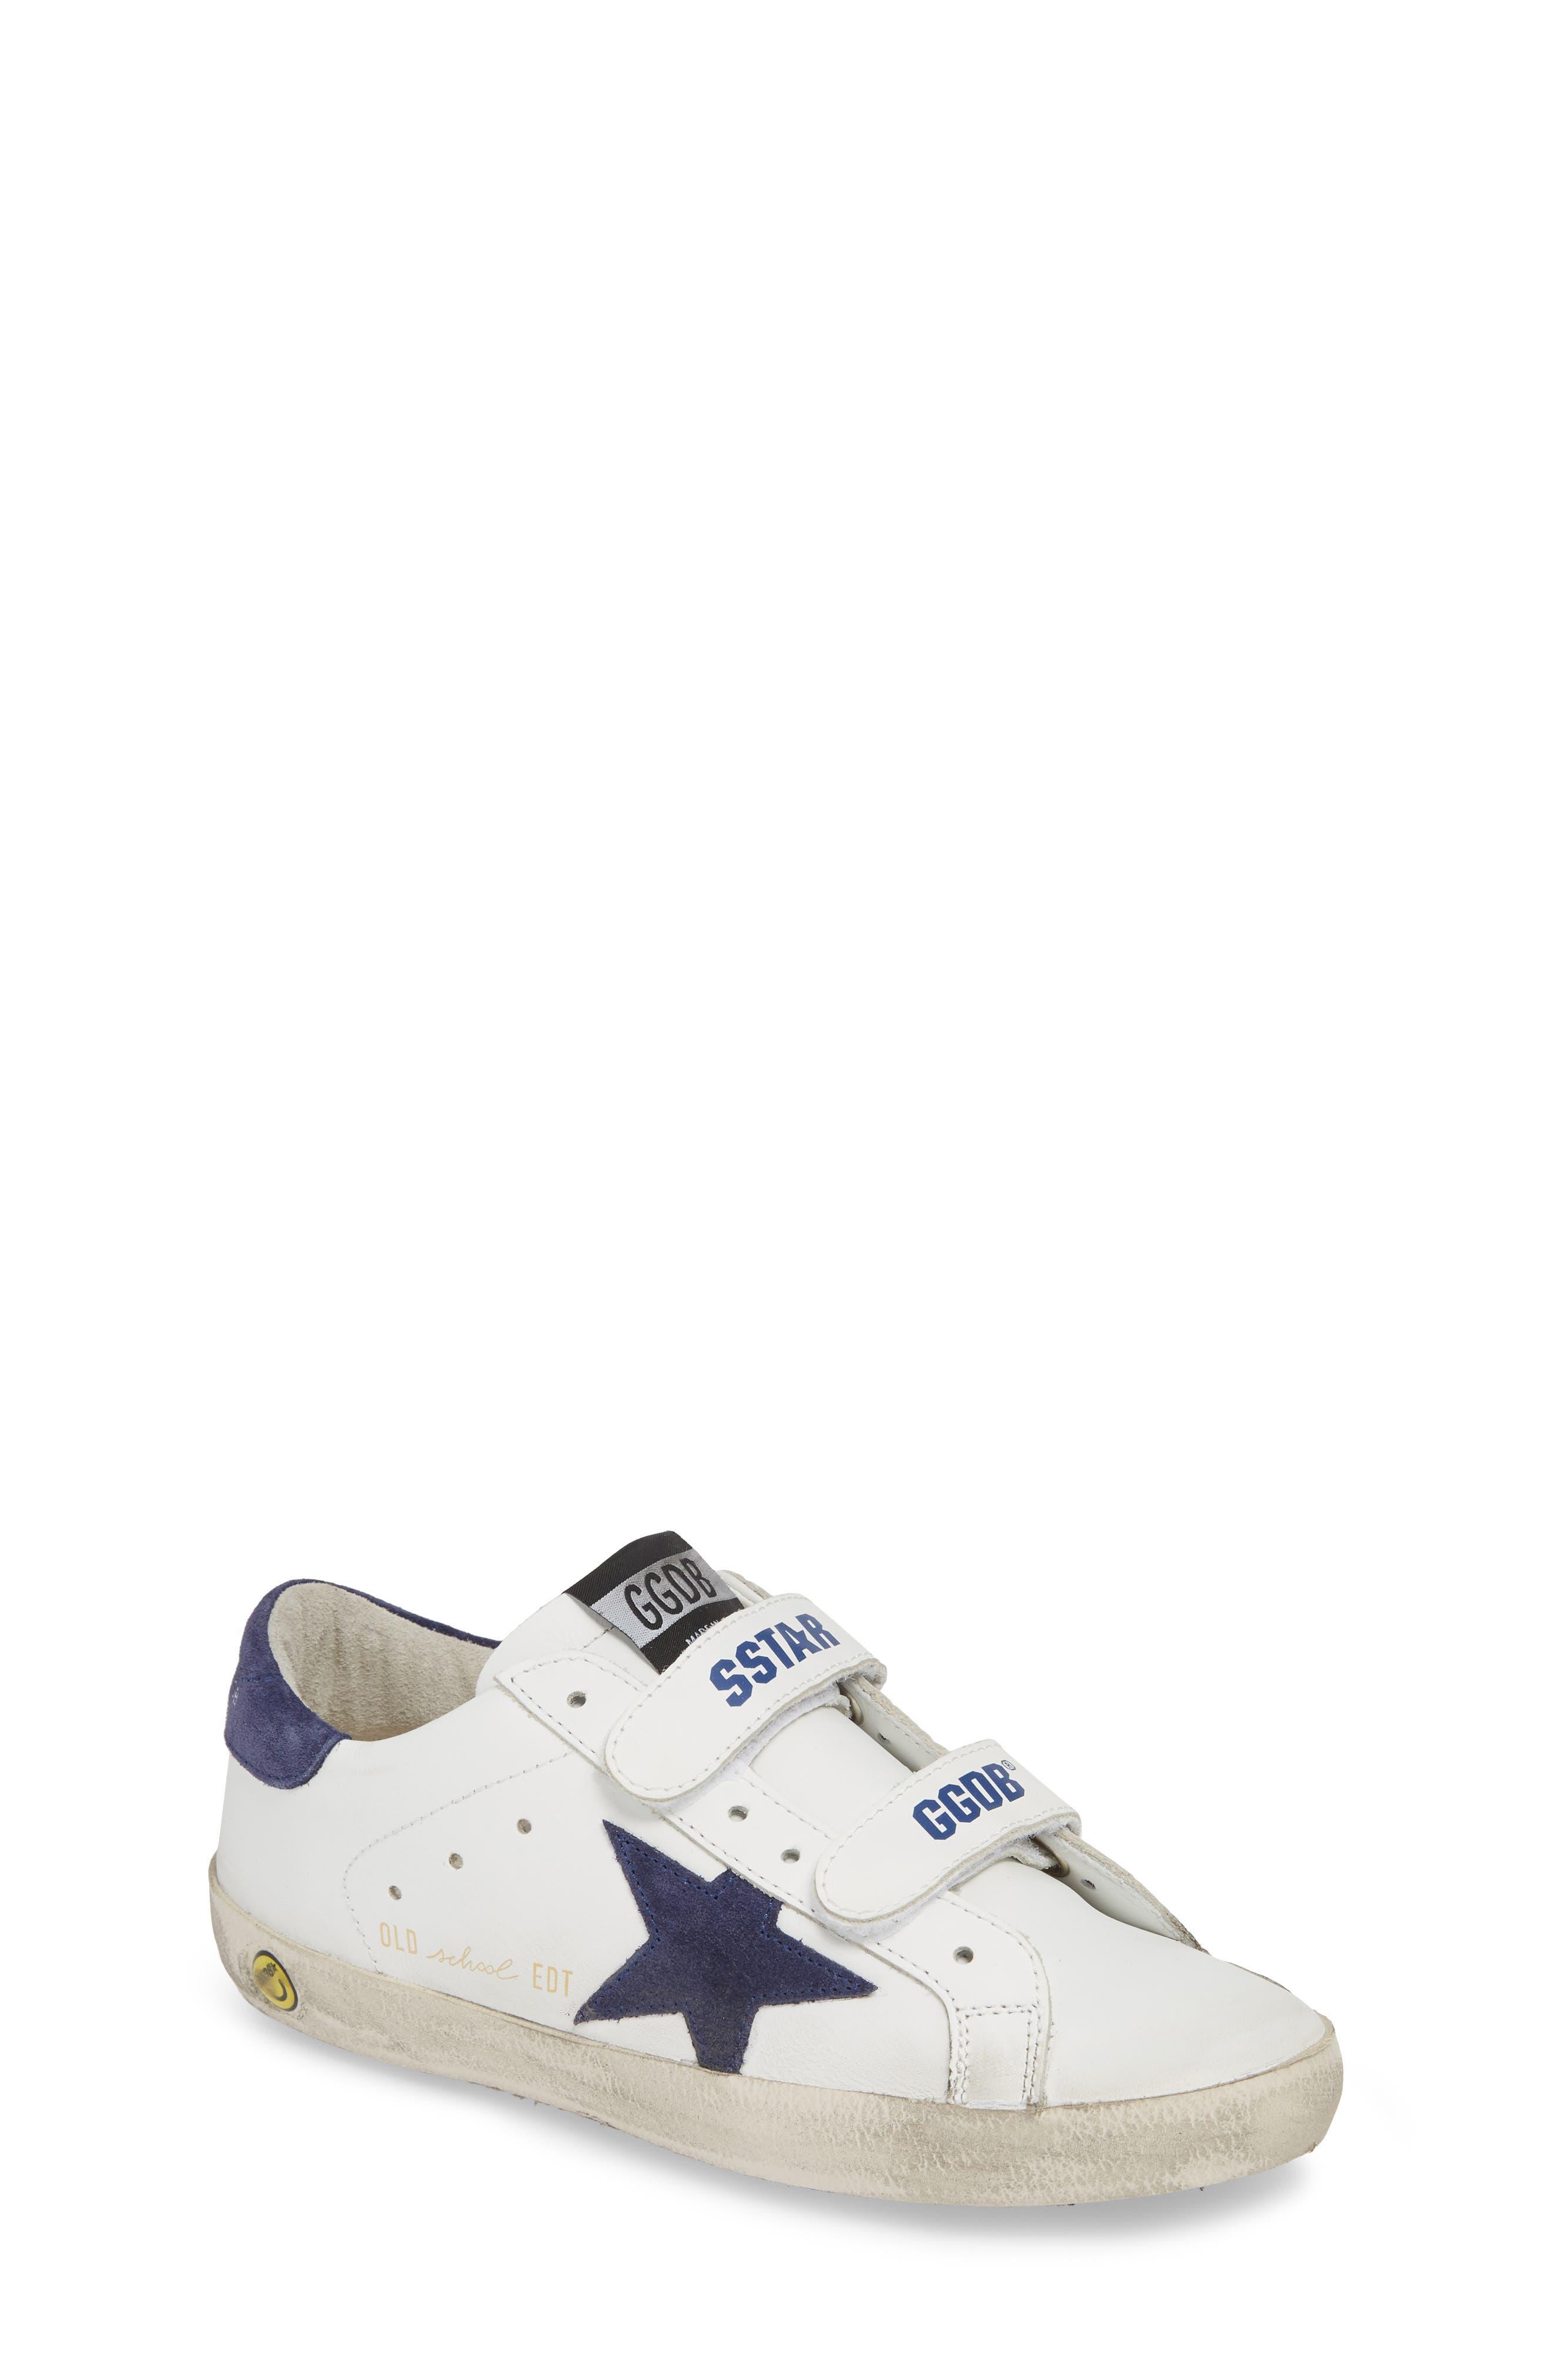 GOLDEN GOOSE Glitter Old School Sneaker, Main, color, WHITE LEATHER/ NAVY STAR